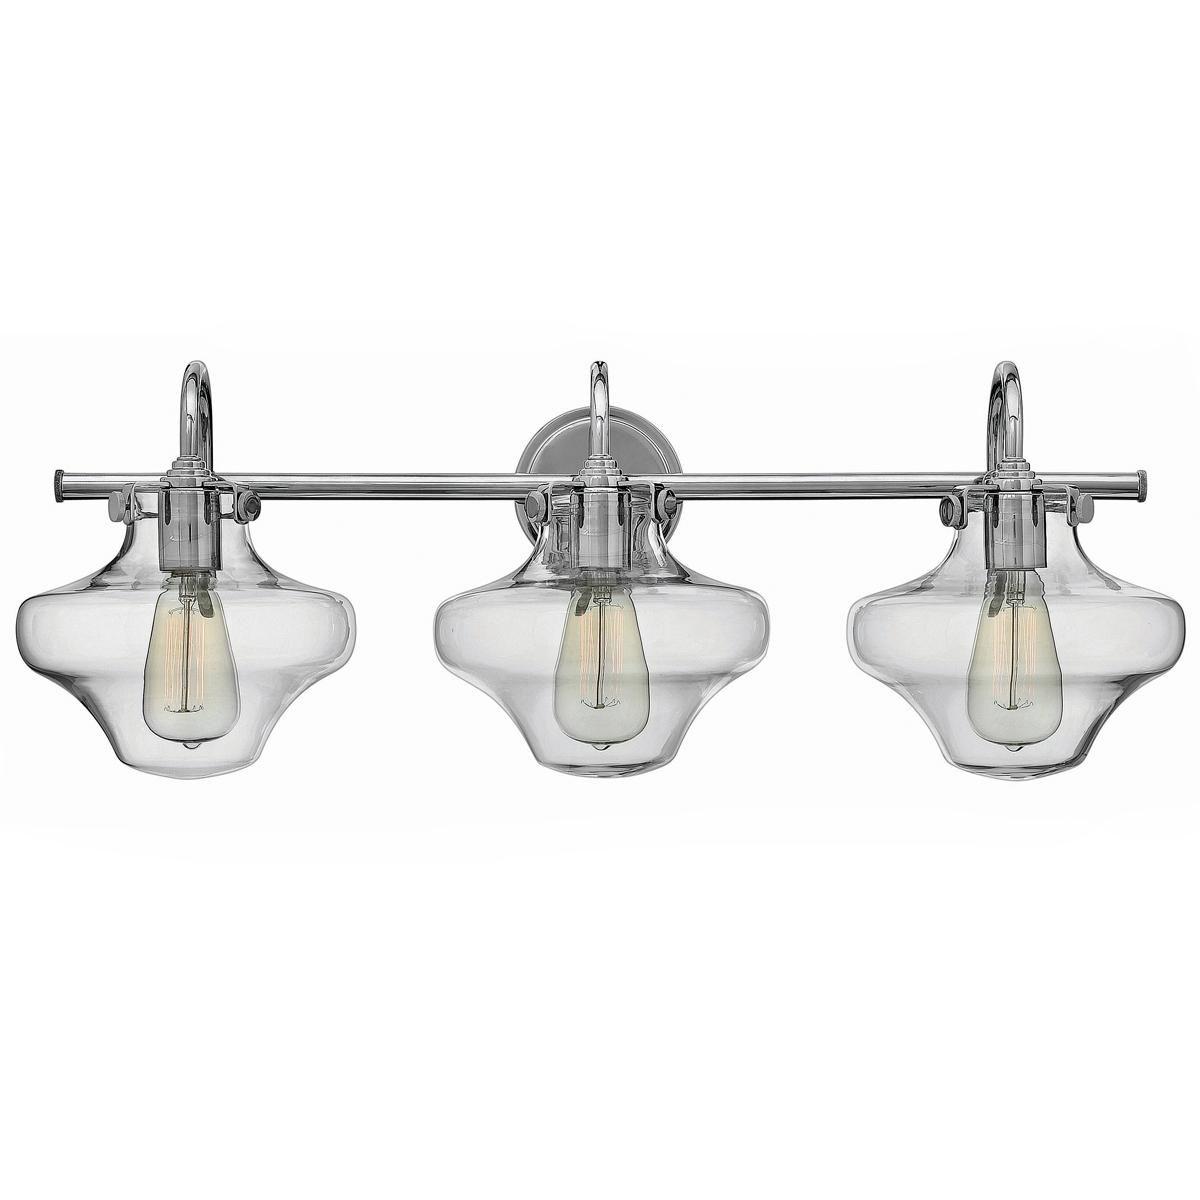 Bathroom Vanity Lights Clear Glass modern clear schoolhouse globe vanity - 3 light | nickel finish